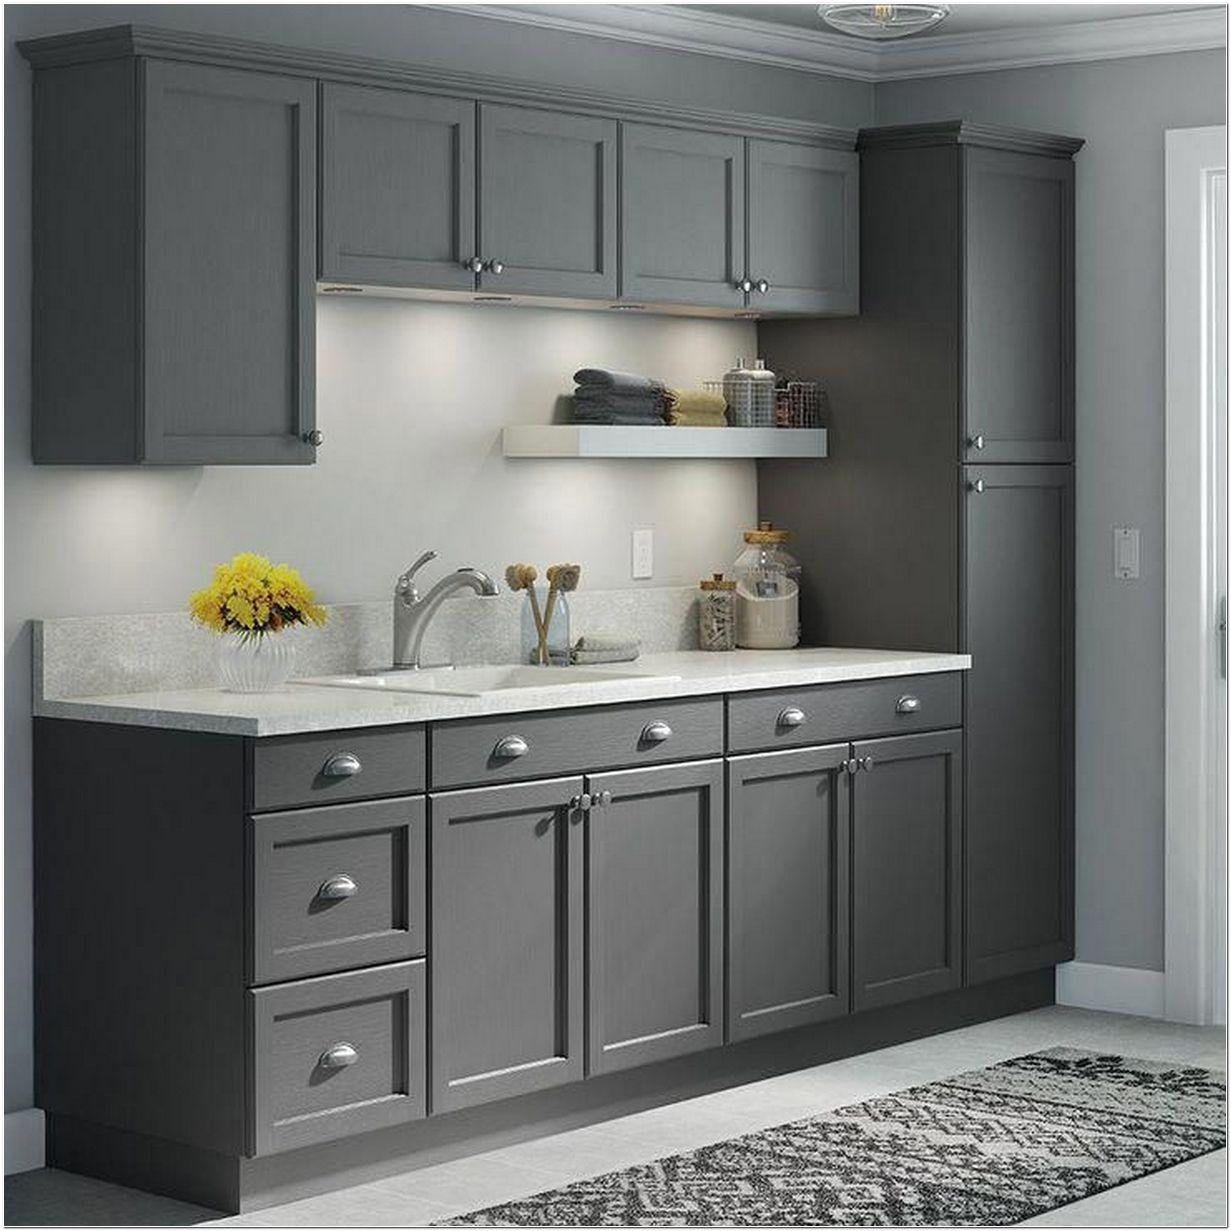 9 Dark Grey Shaker Style Kitchen Ideas   Myhomeorganic